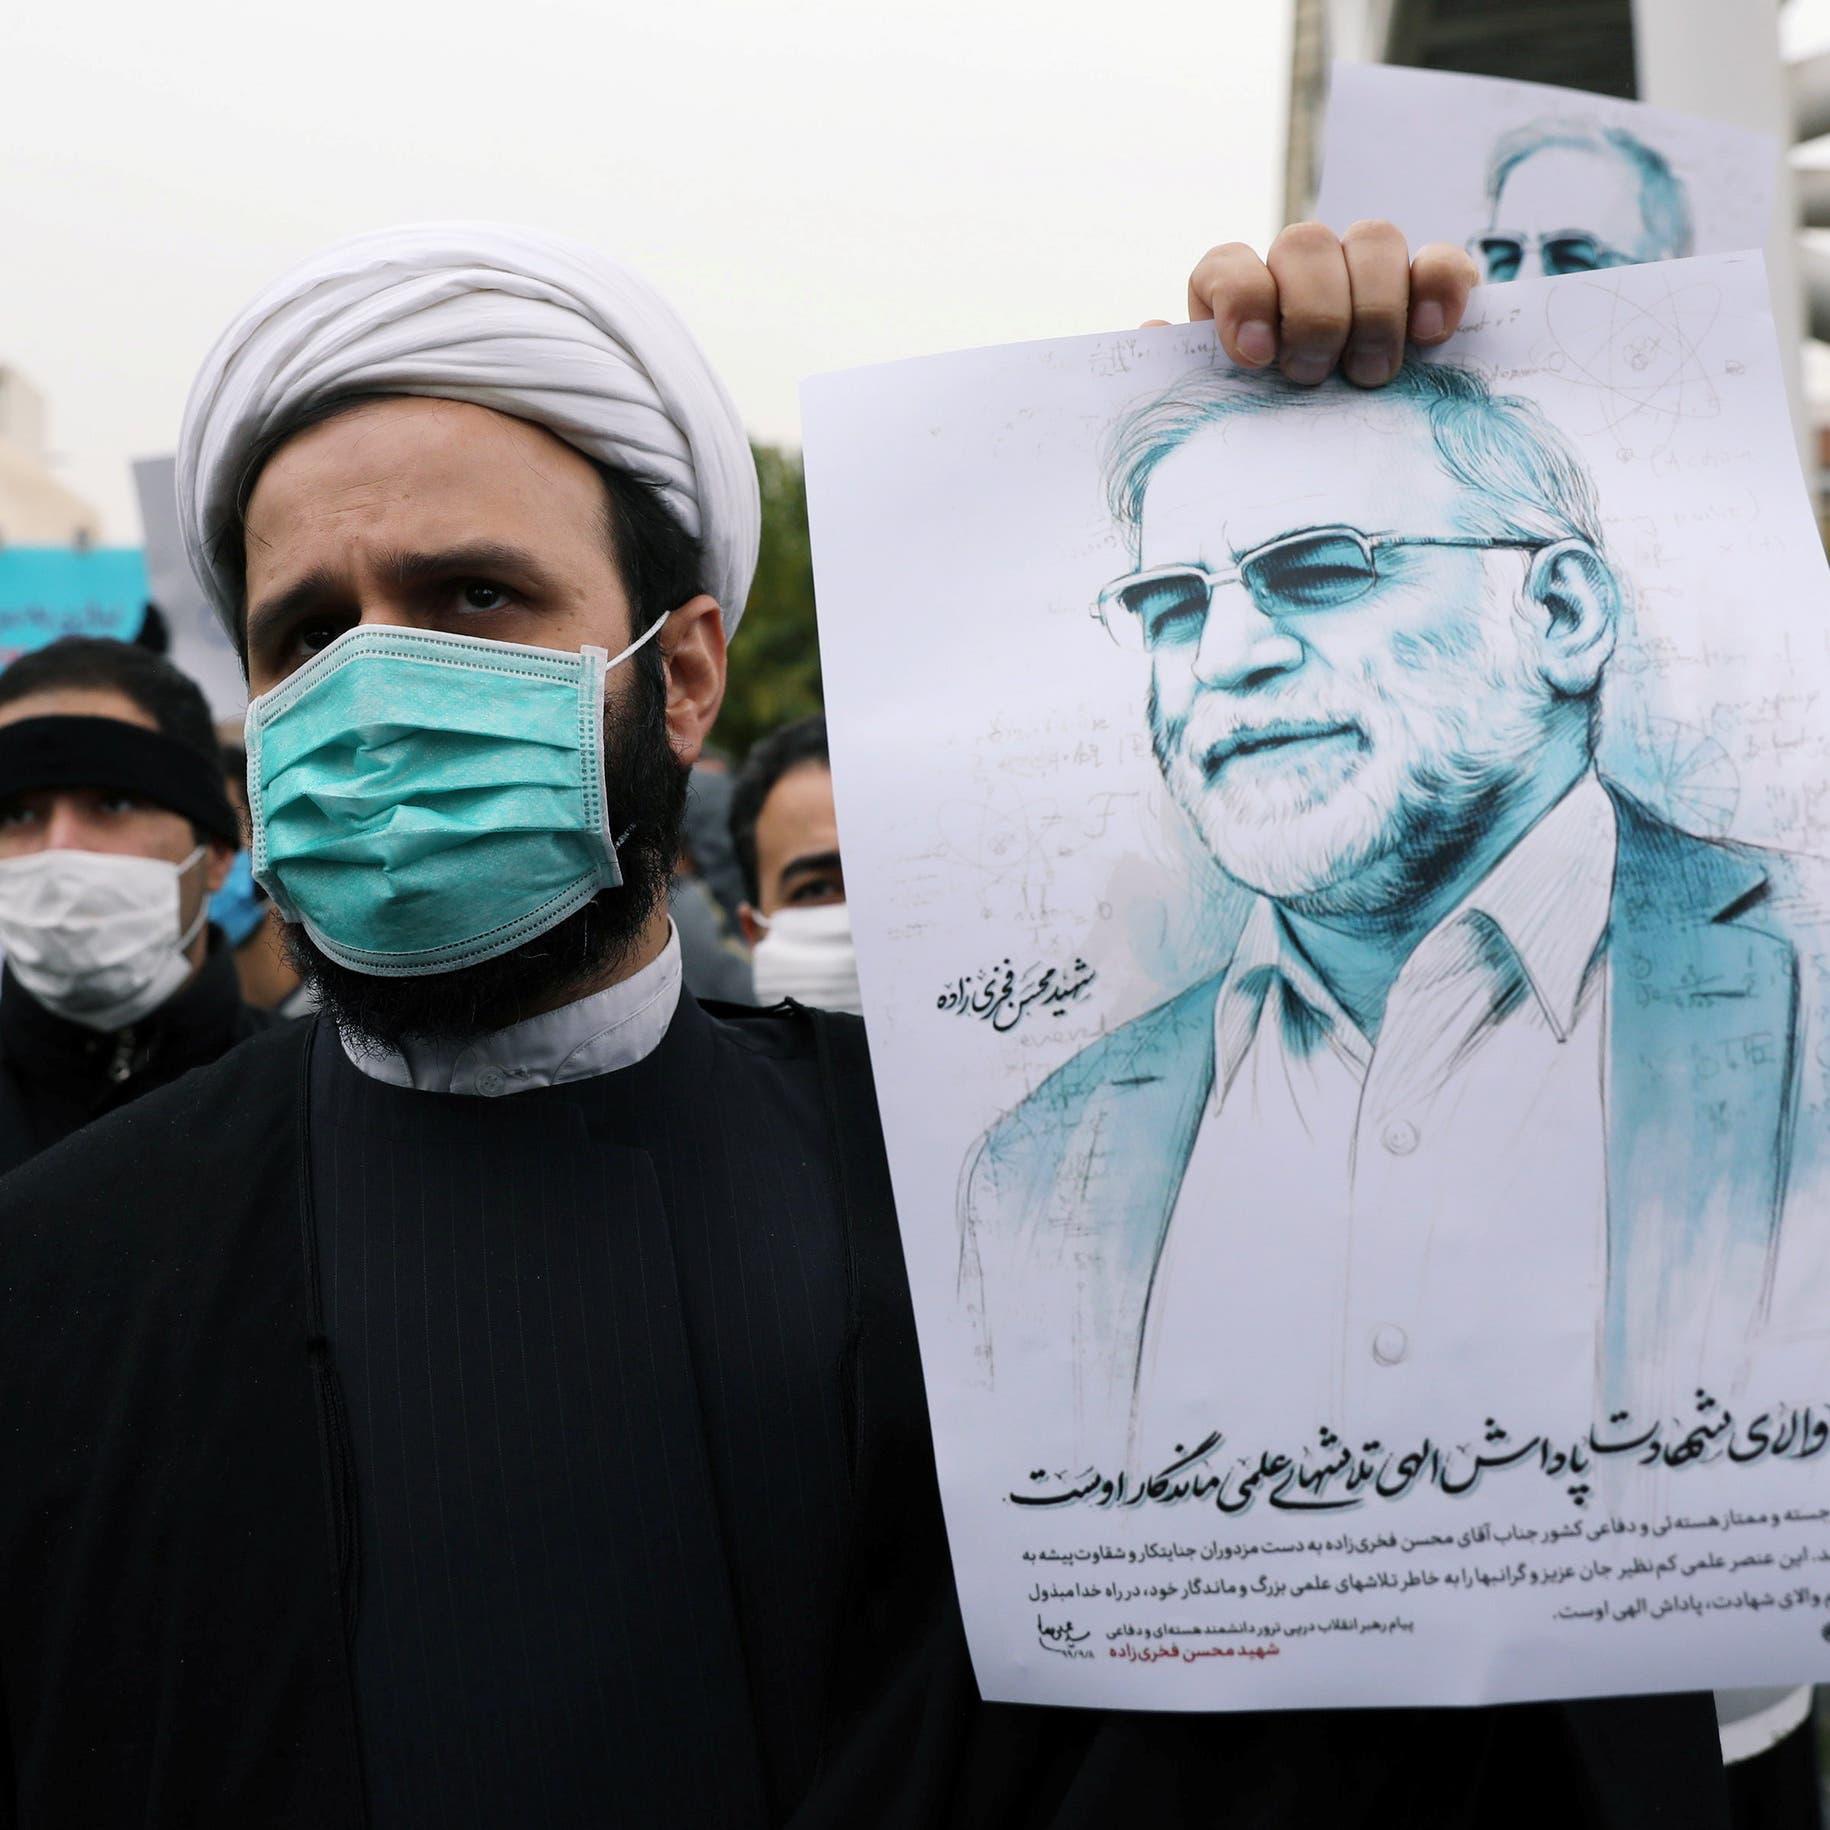 هل يؤثر اغتيال فخري زاده على خطوات بايدن تجاه إيران؟